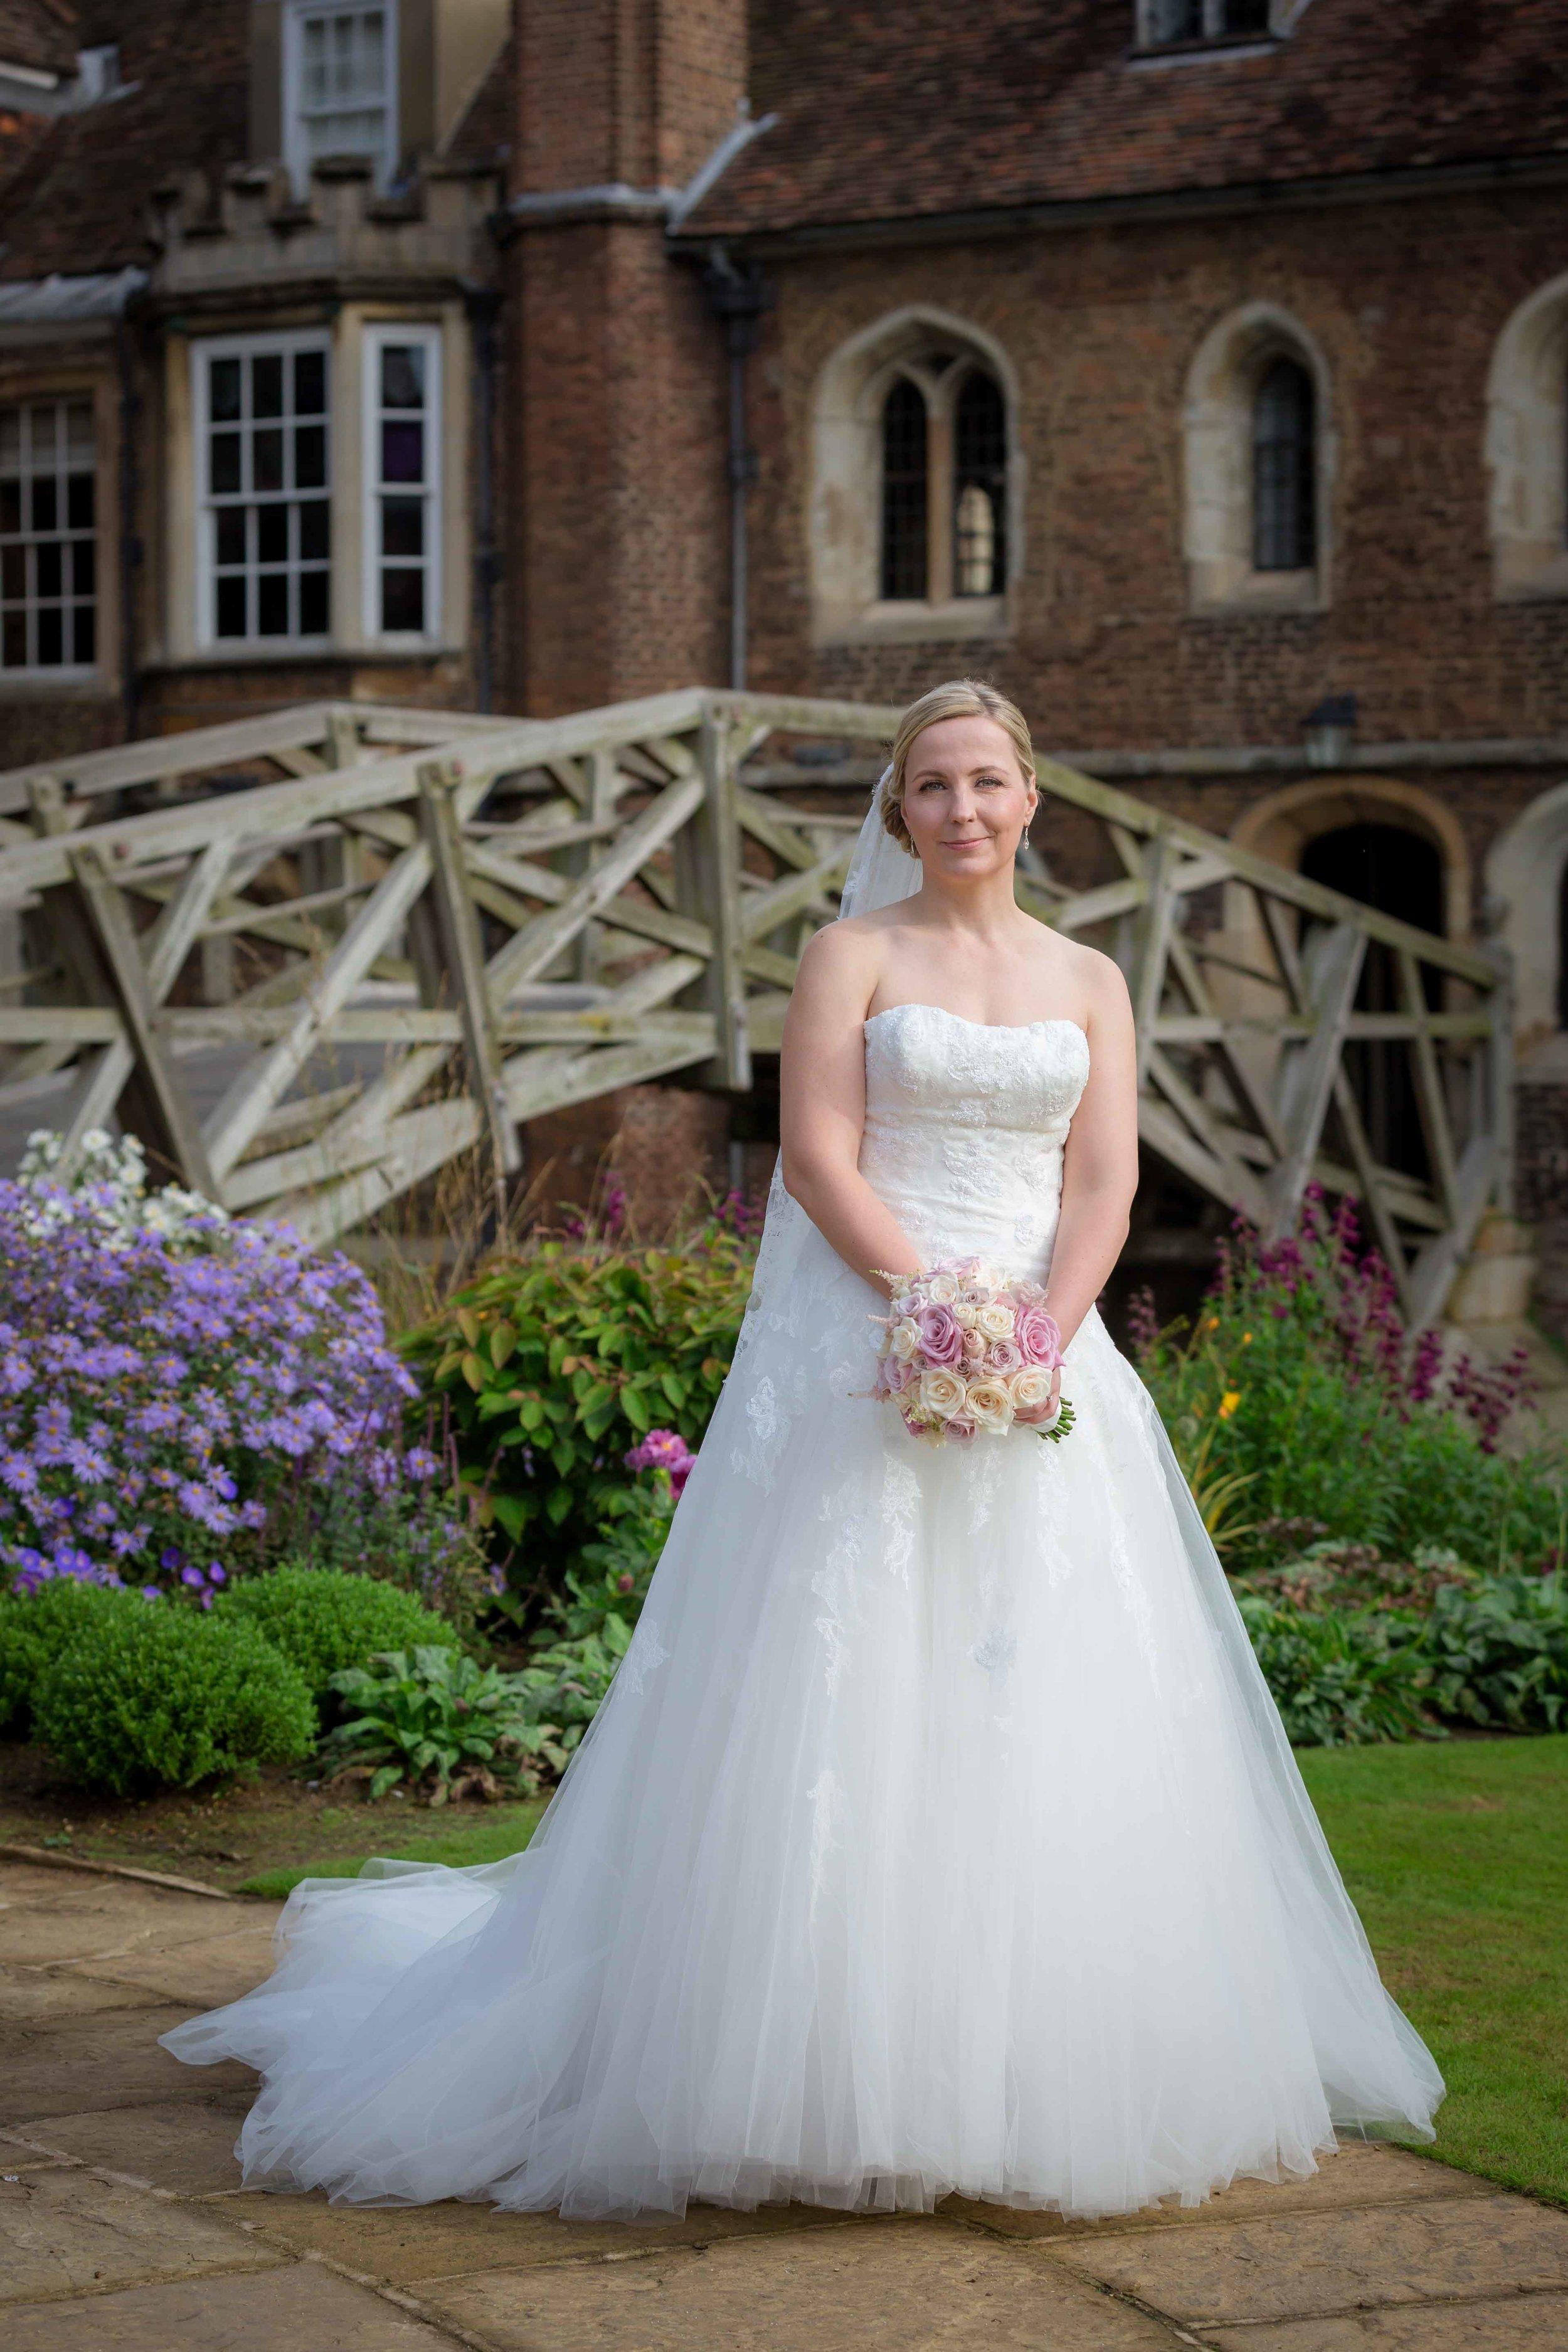 Adrian_Nicole_Charnwood_Weddings_Queens_College_Cambridge-1002.jpg